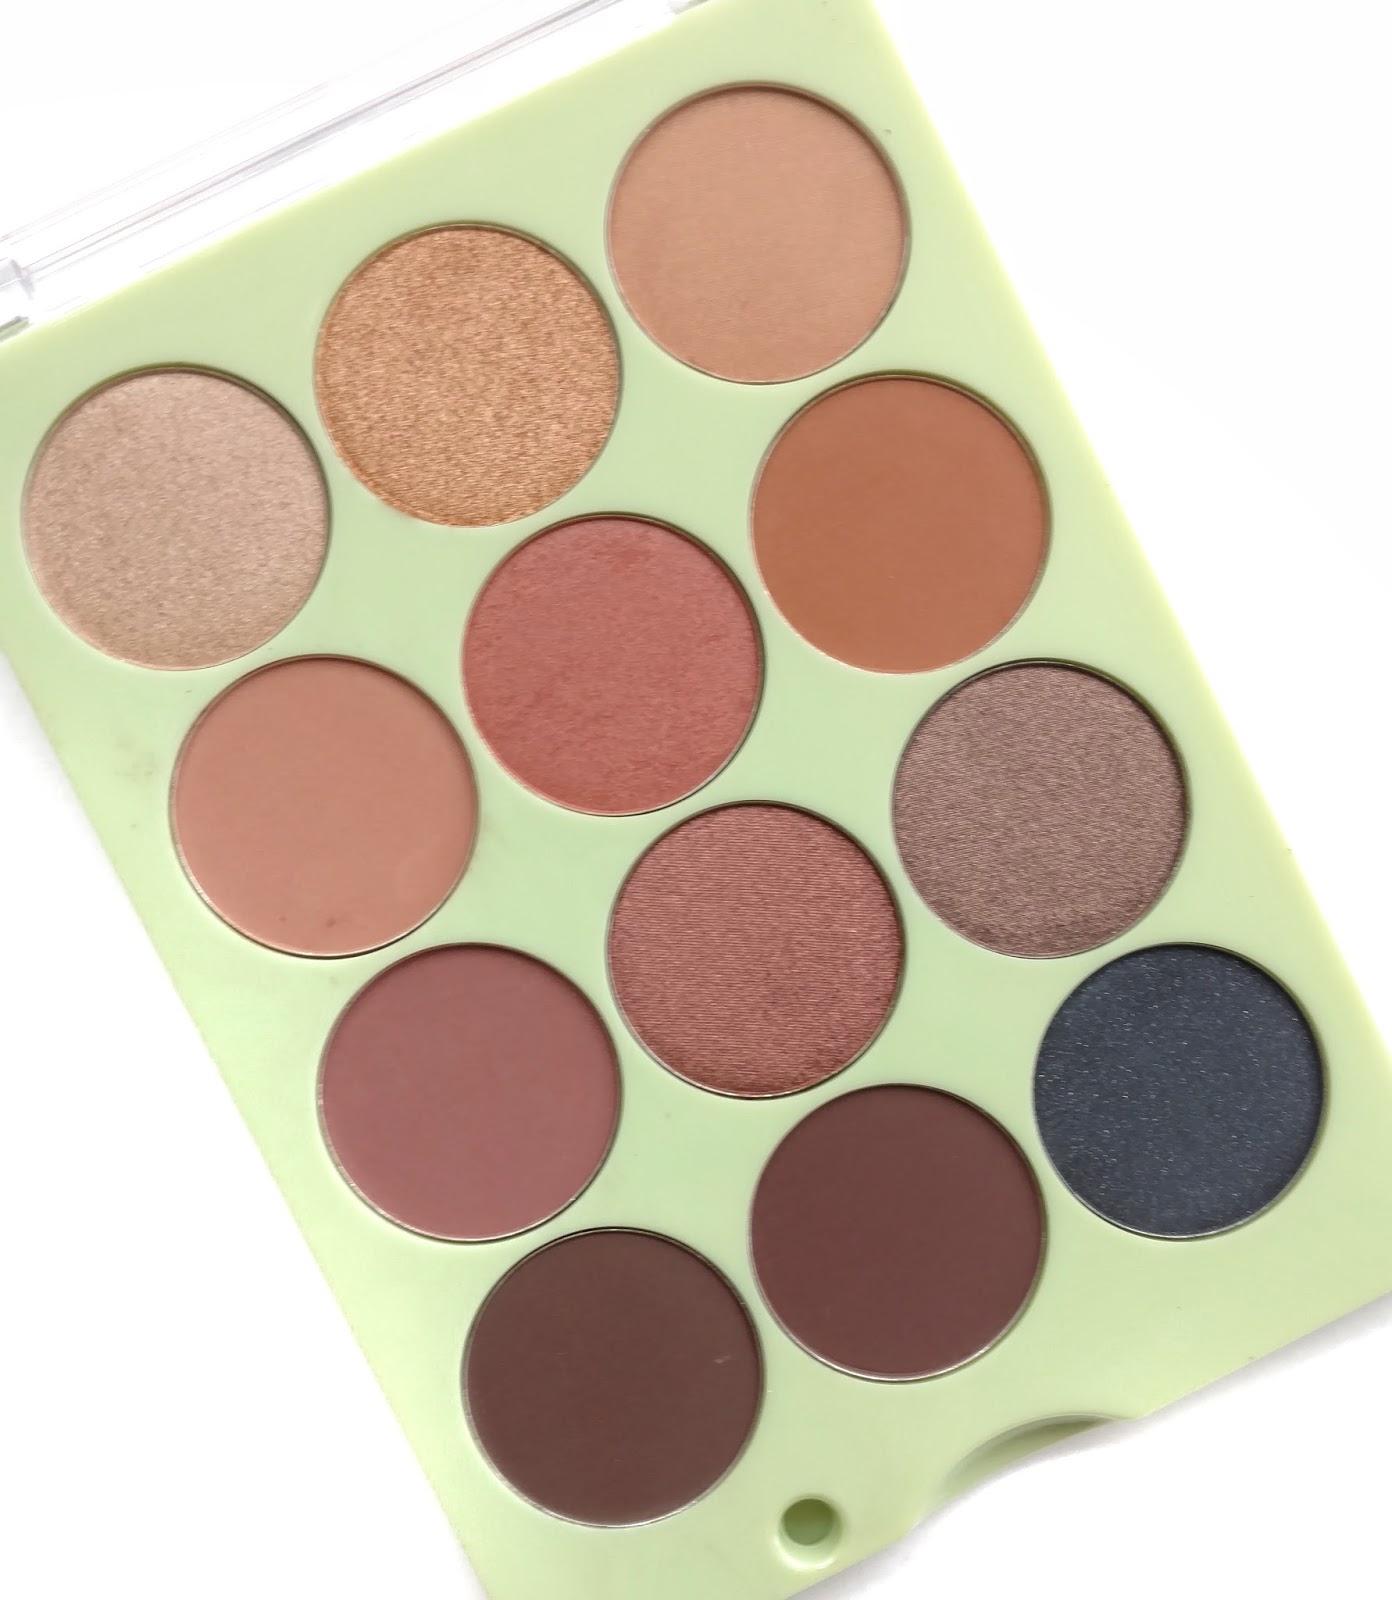 pixi itsjudytime eyeshadow palette